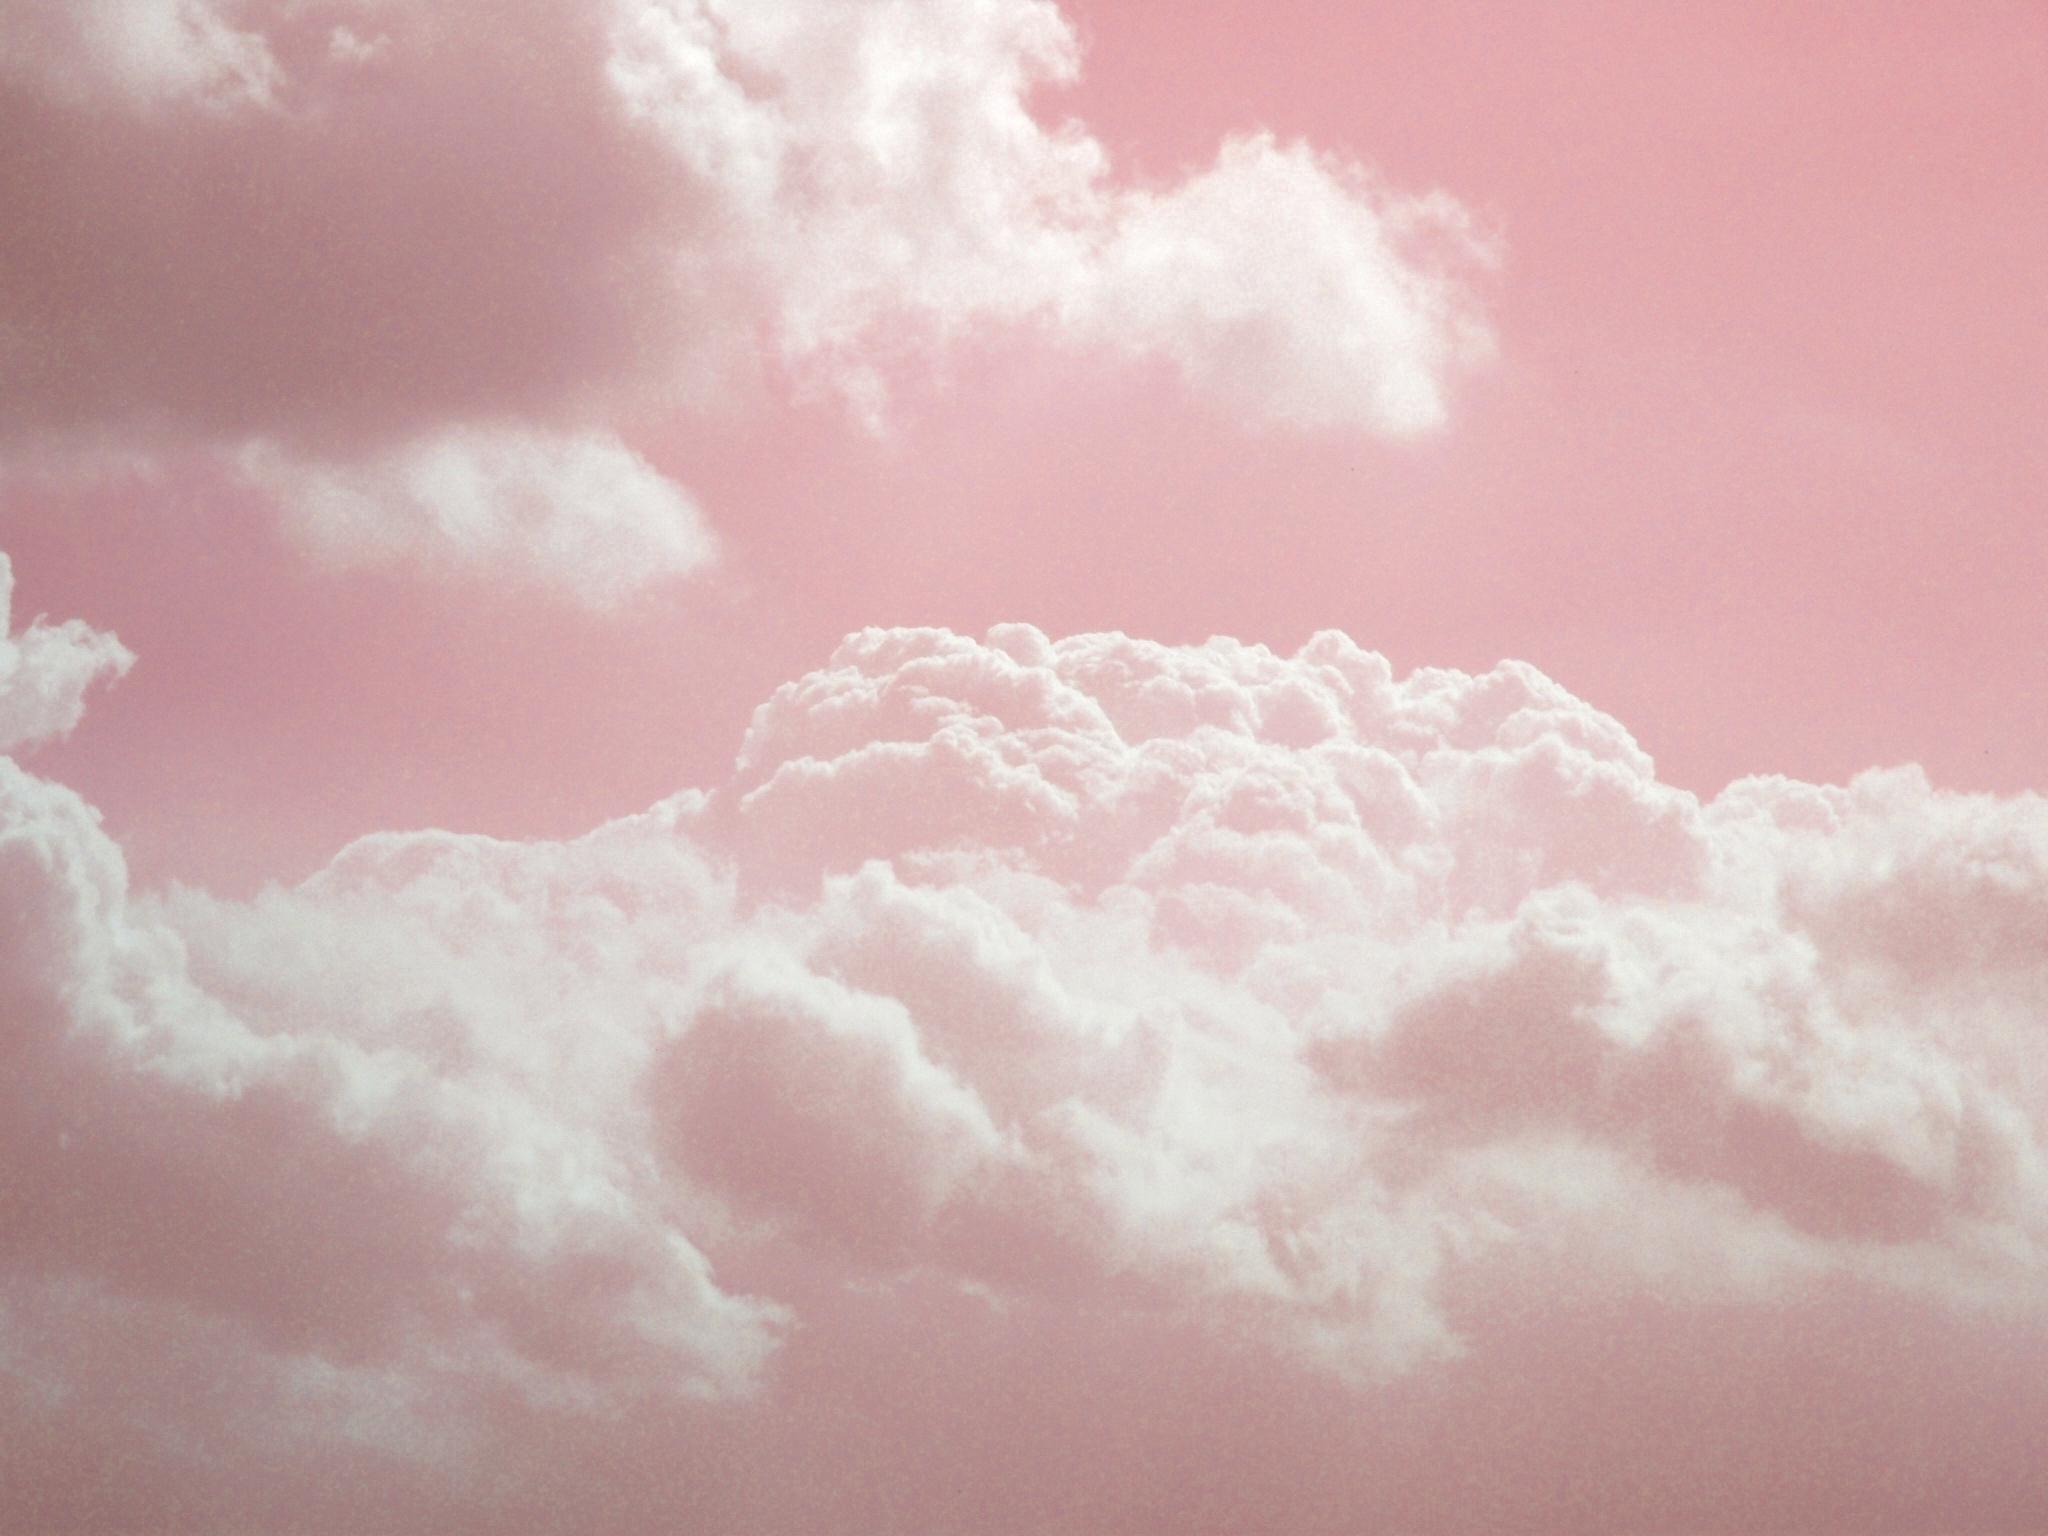 место нежное облако цветов фото любом